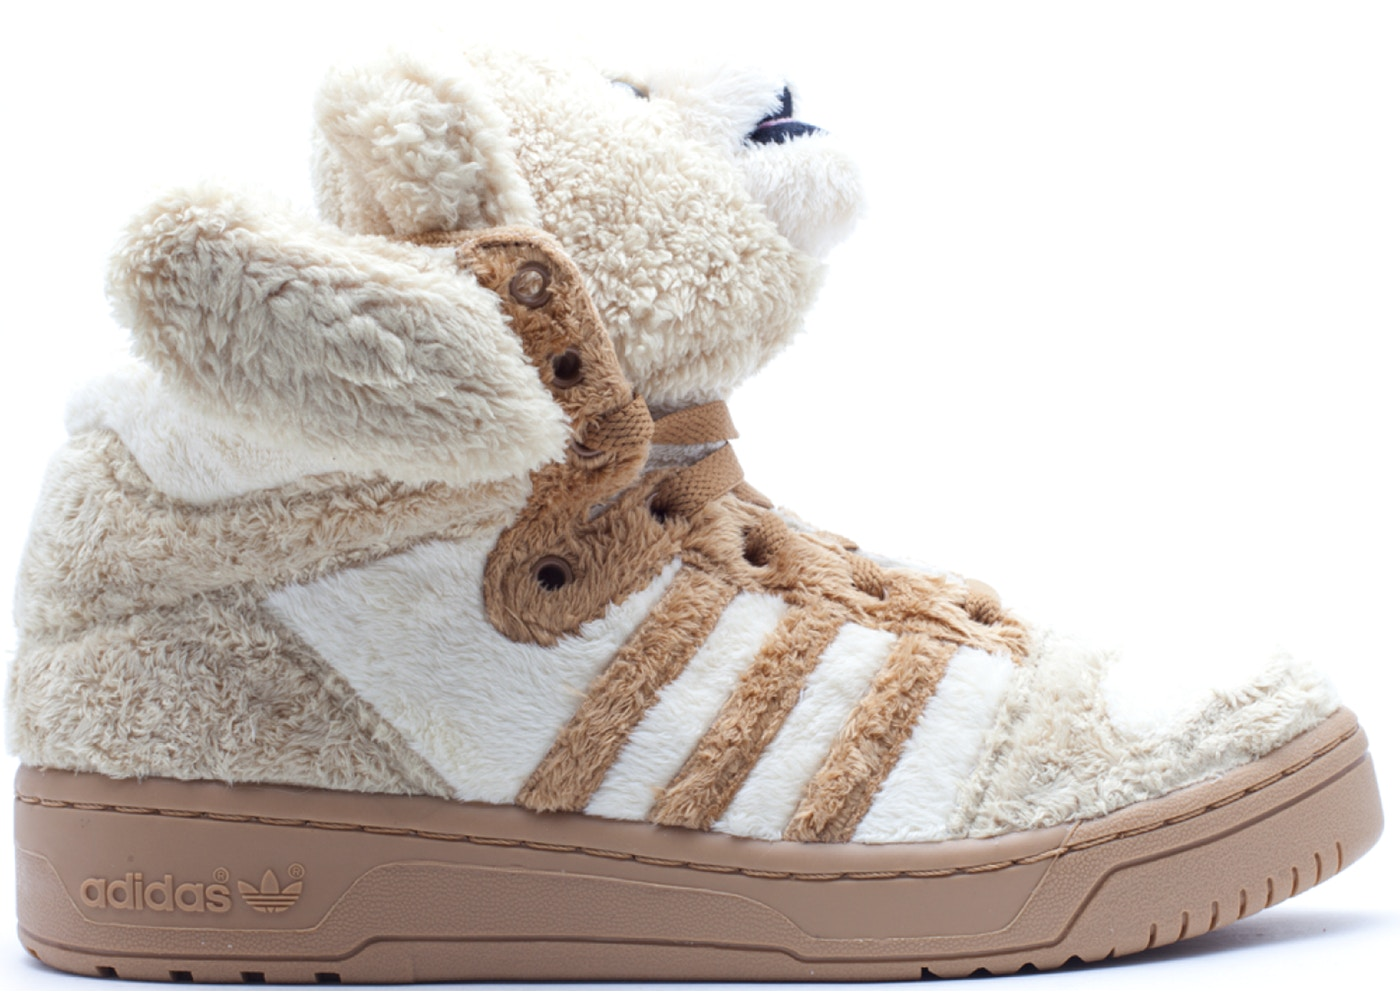 forestille løg lykke jeremy scott adidas teddy Leonardoda slette dyd